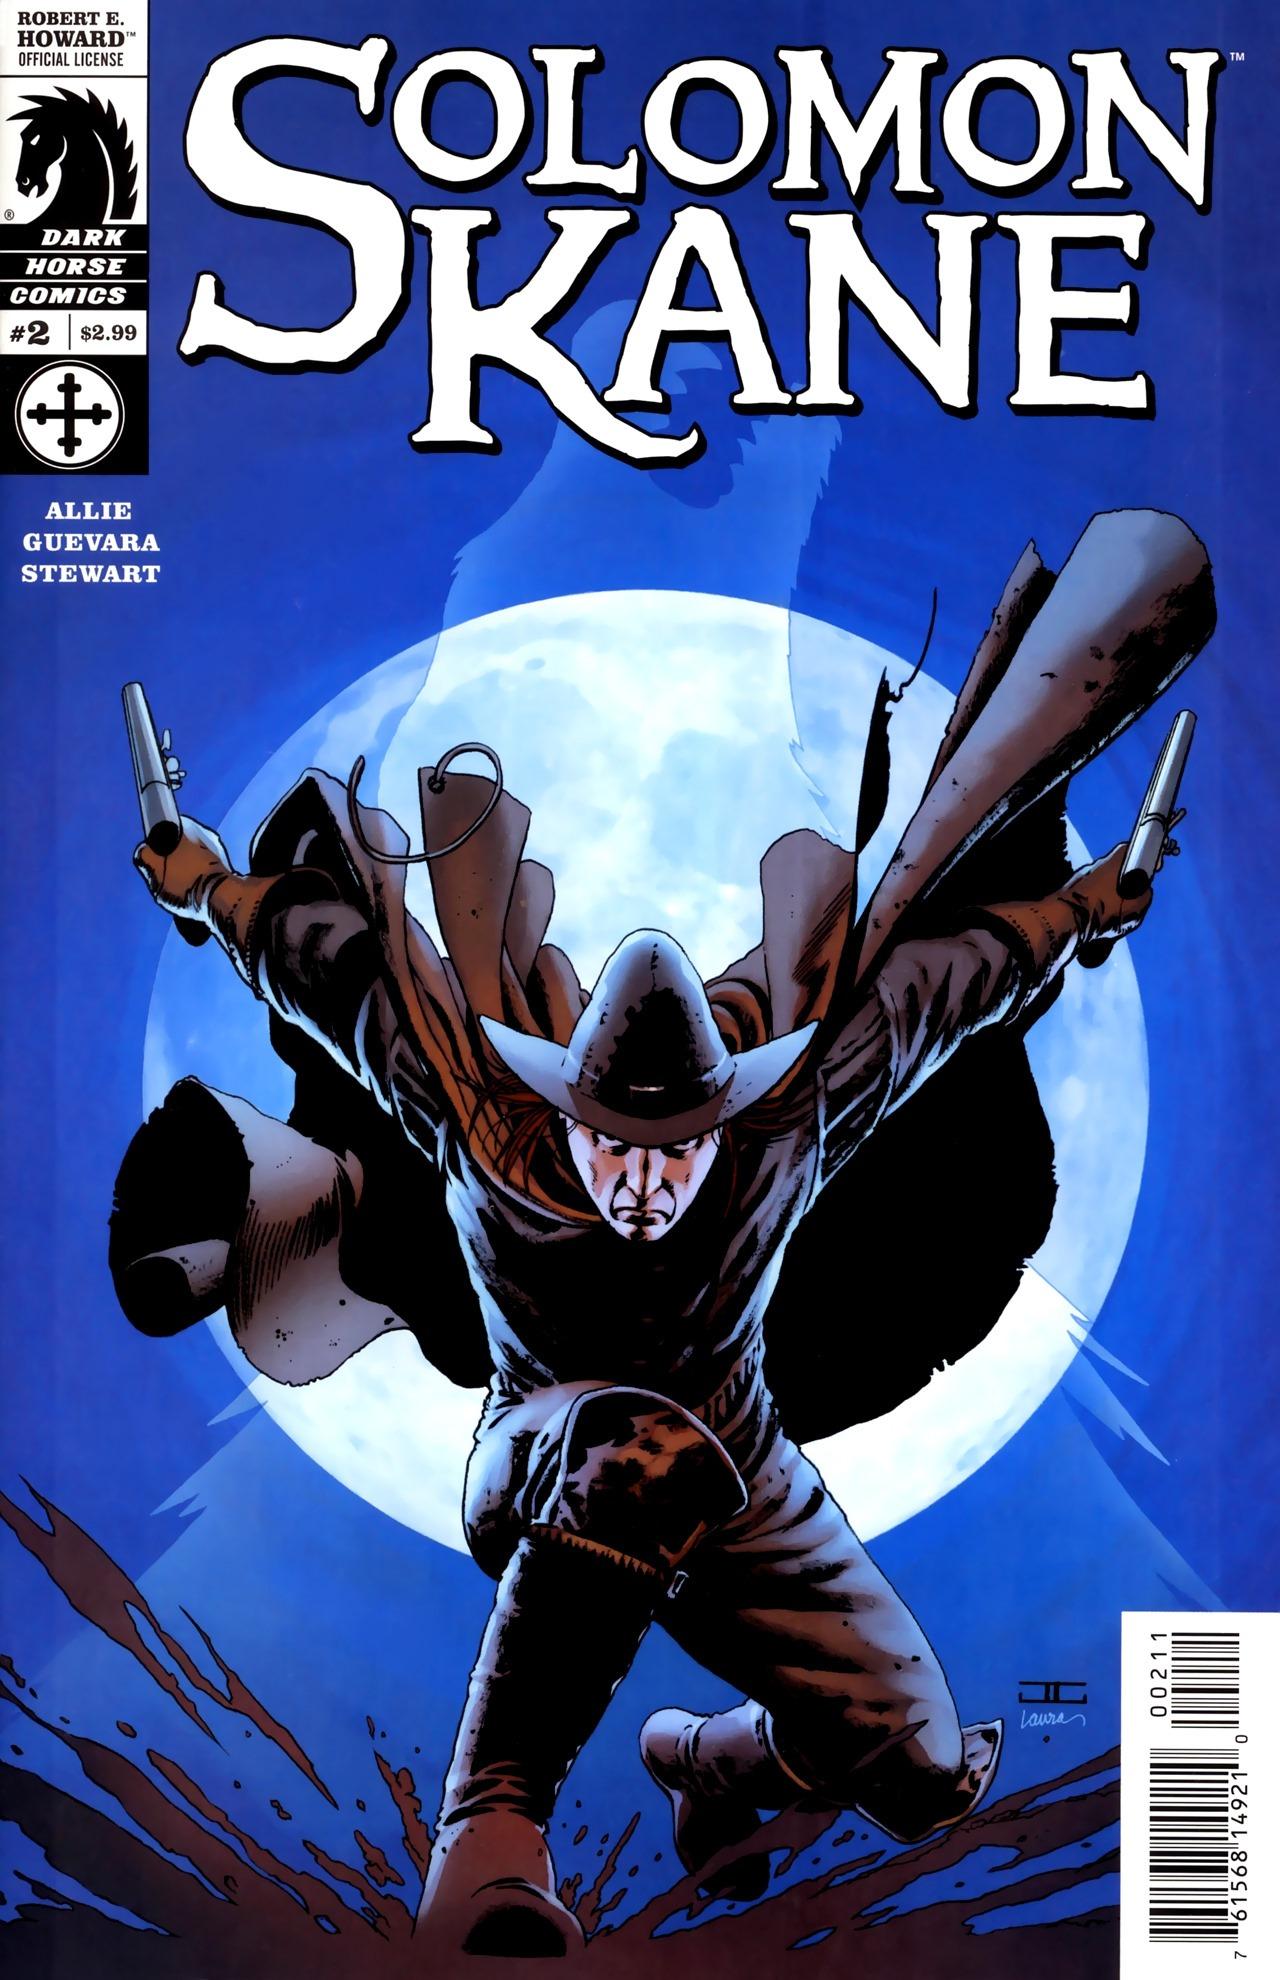 Read online Solomon Kane comic -  Issue #2 - 1